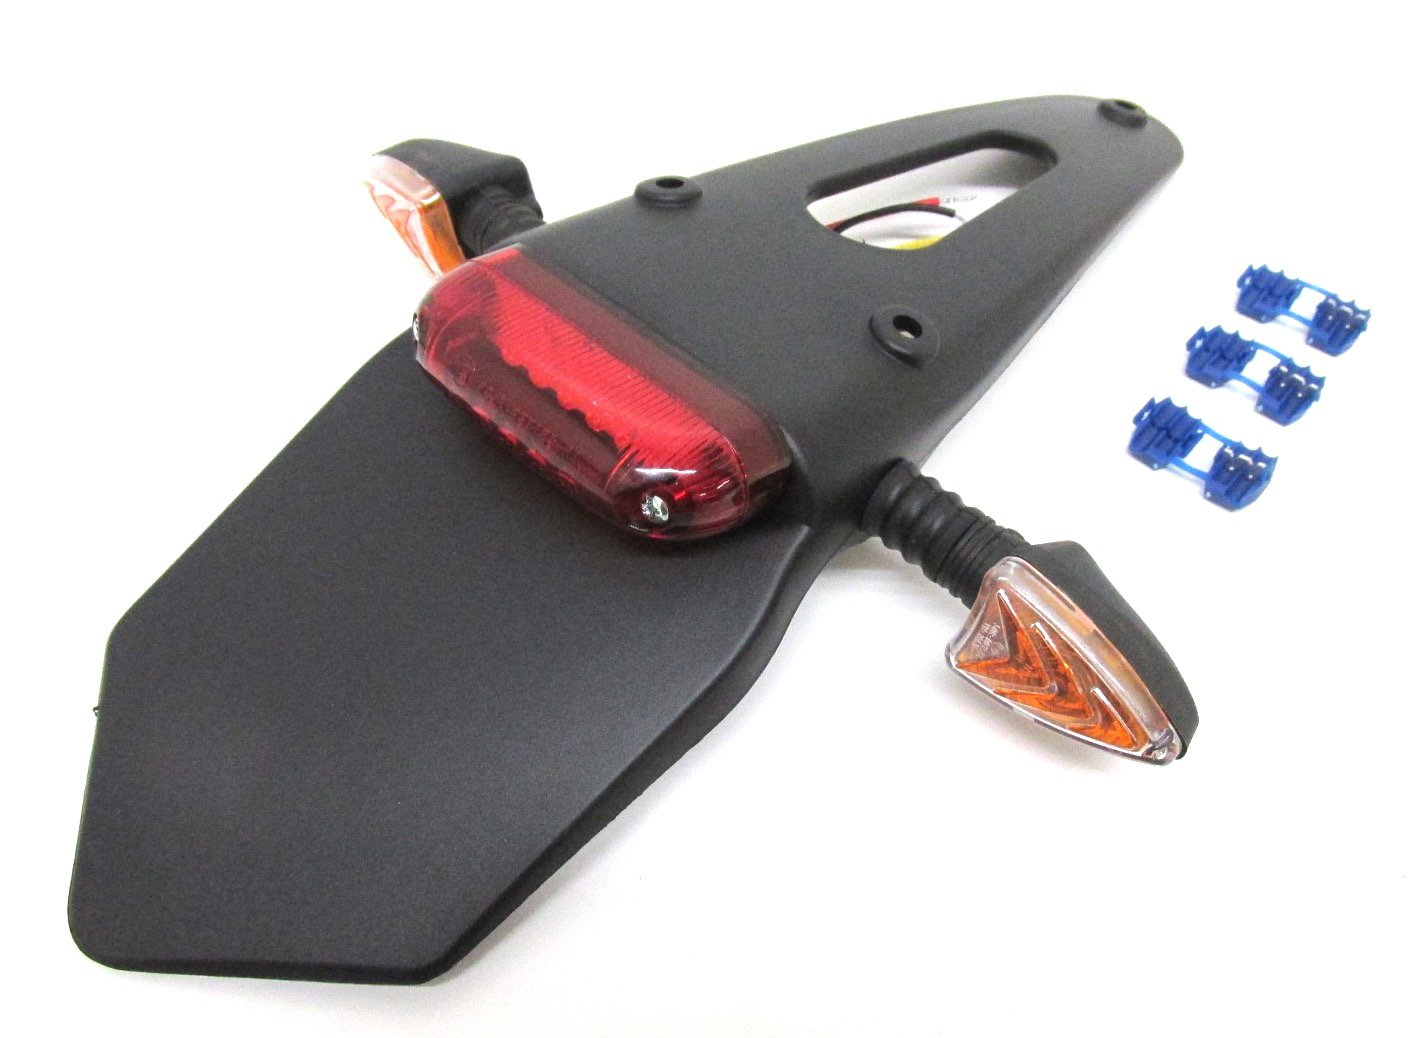 E-gepr/üft ohne KZB Motorrad LED R/ücklicht Rail Ma/ße: L=105mm x B=19mm x H=18mm biegsam rot